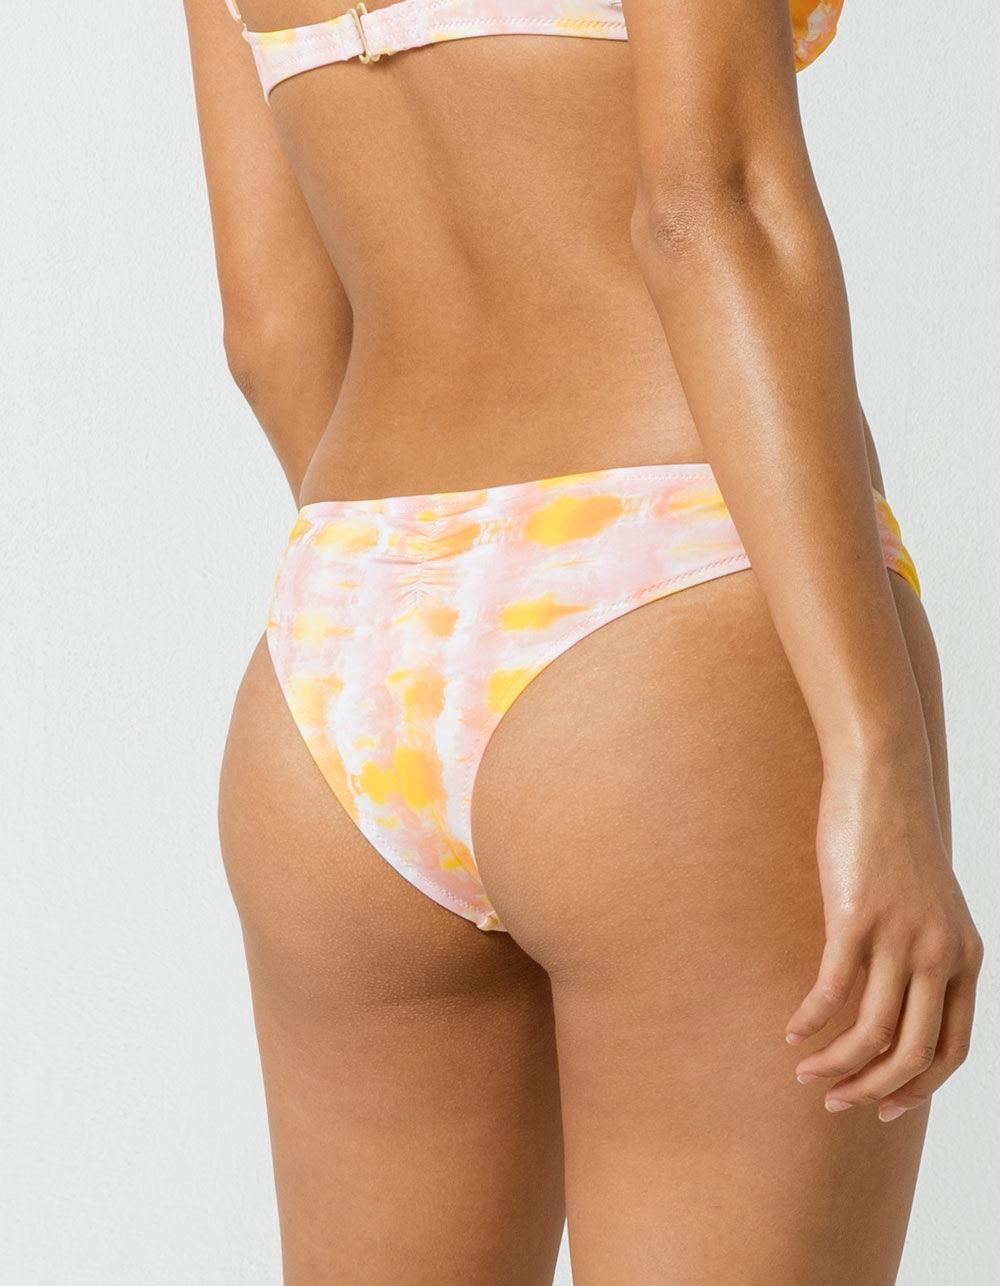 6a3b4c2029 Rhythm - Multicolor Cancun Sunset Cheeky Bikini Bottoms - Lyst. View  fullscreen